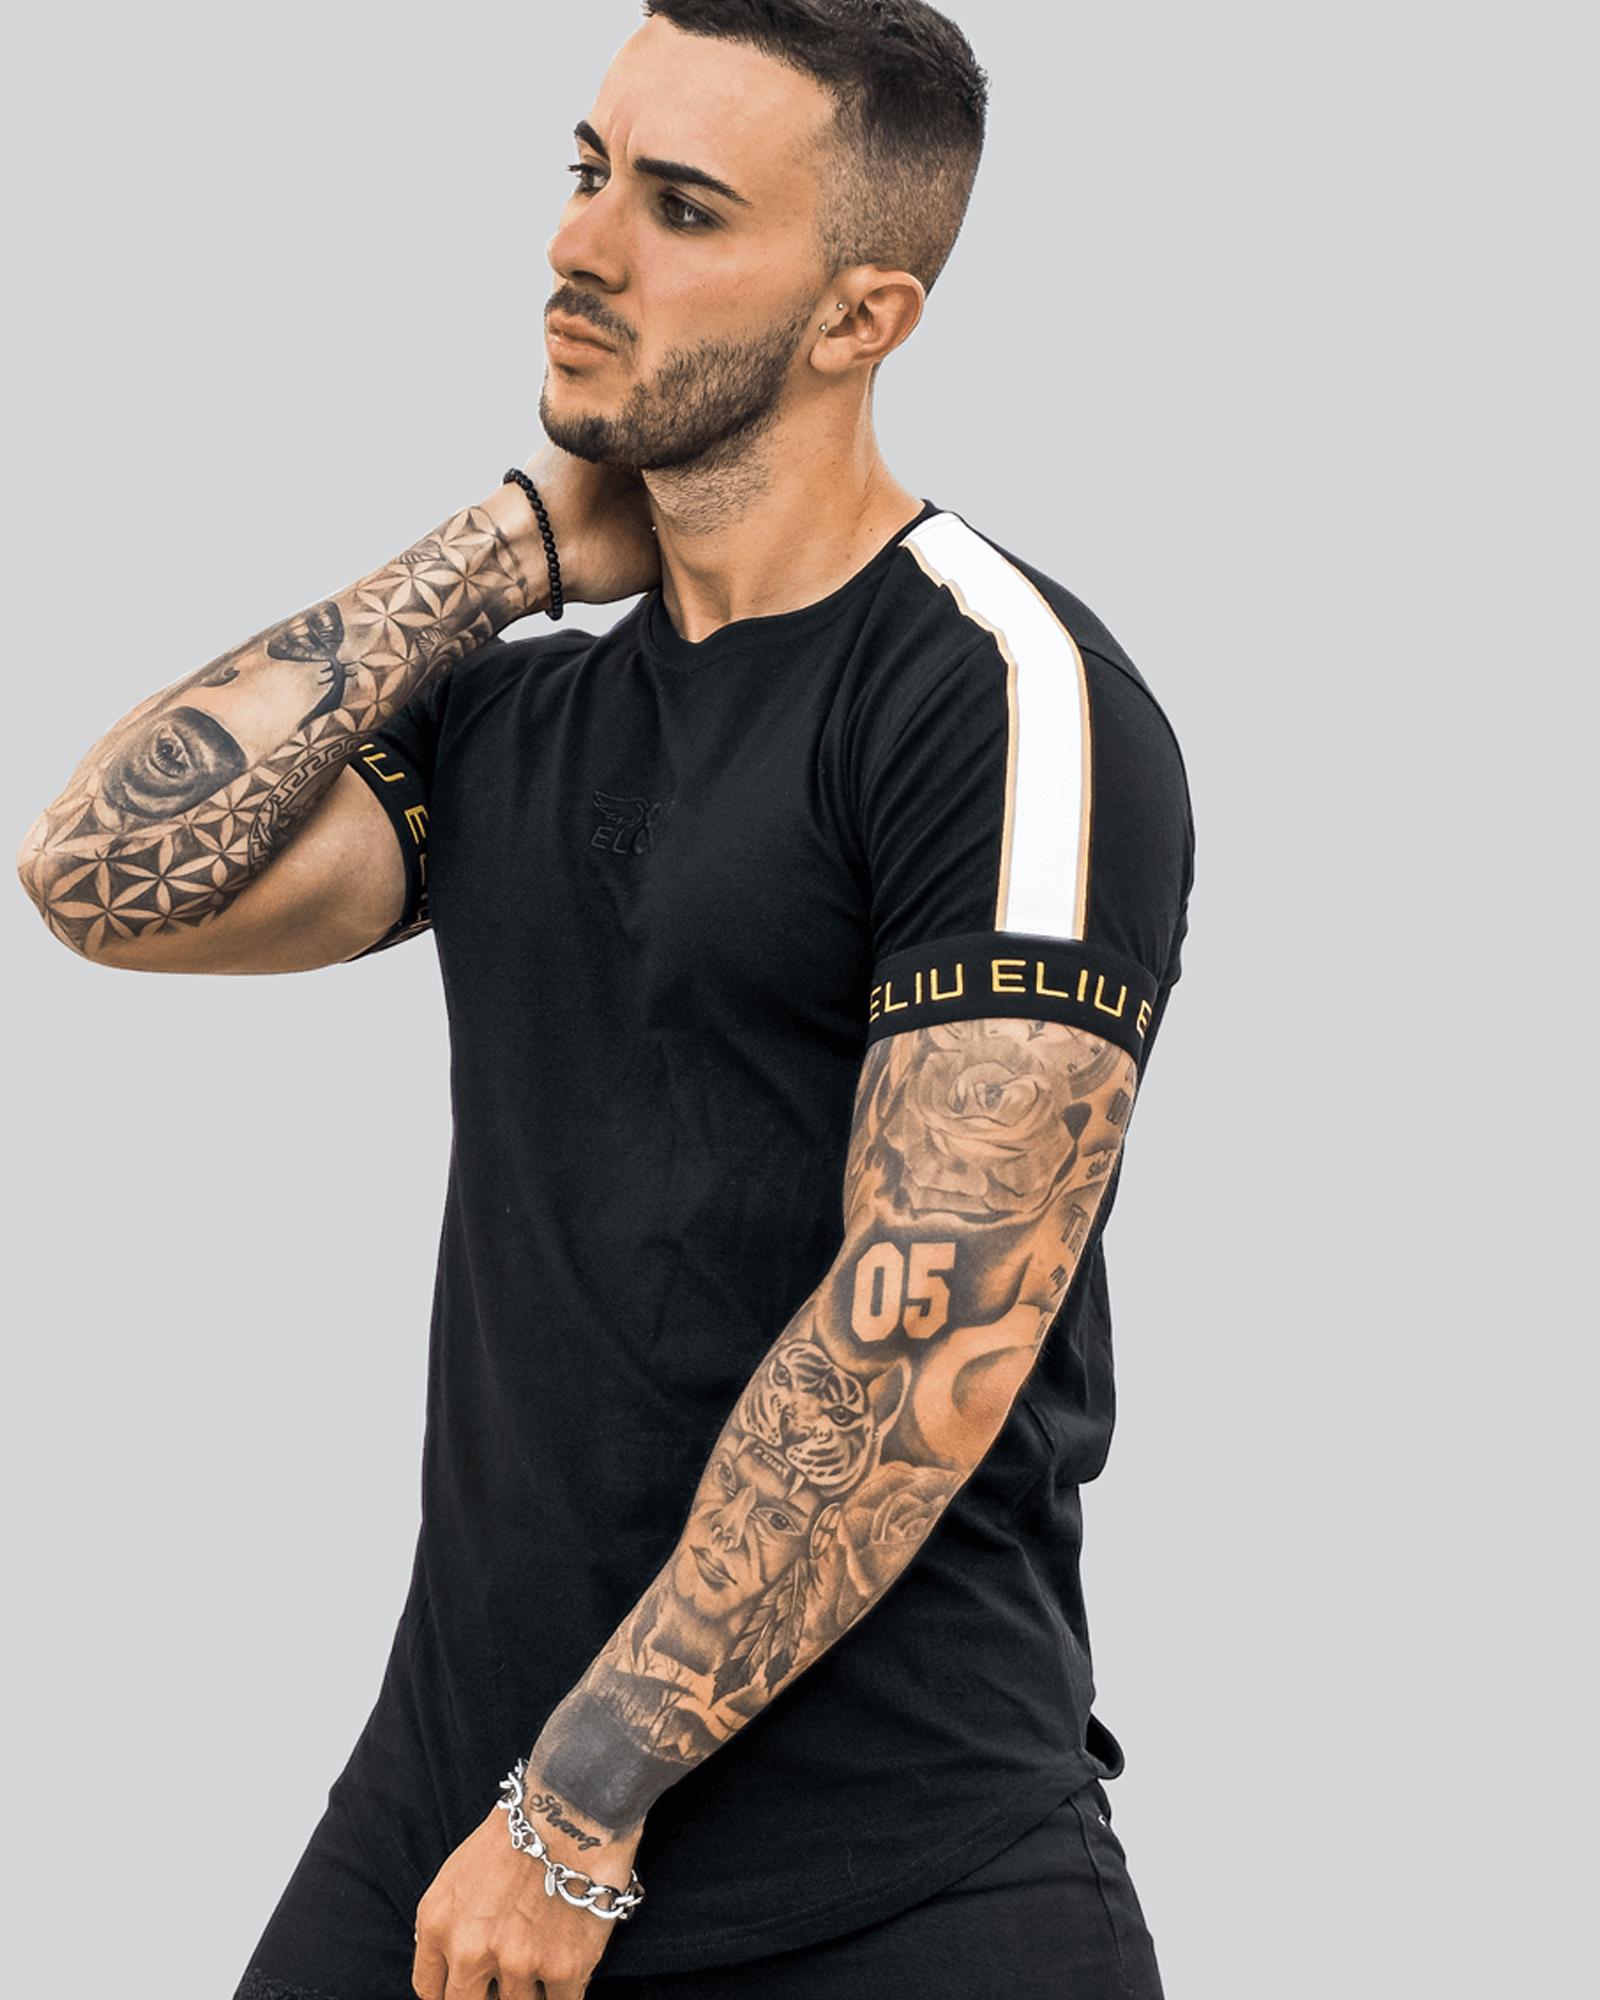 Camiseta Clásica con Elástico